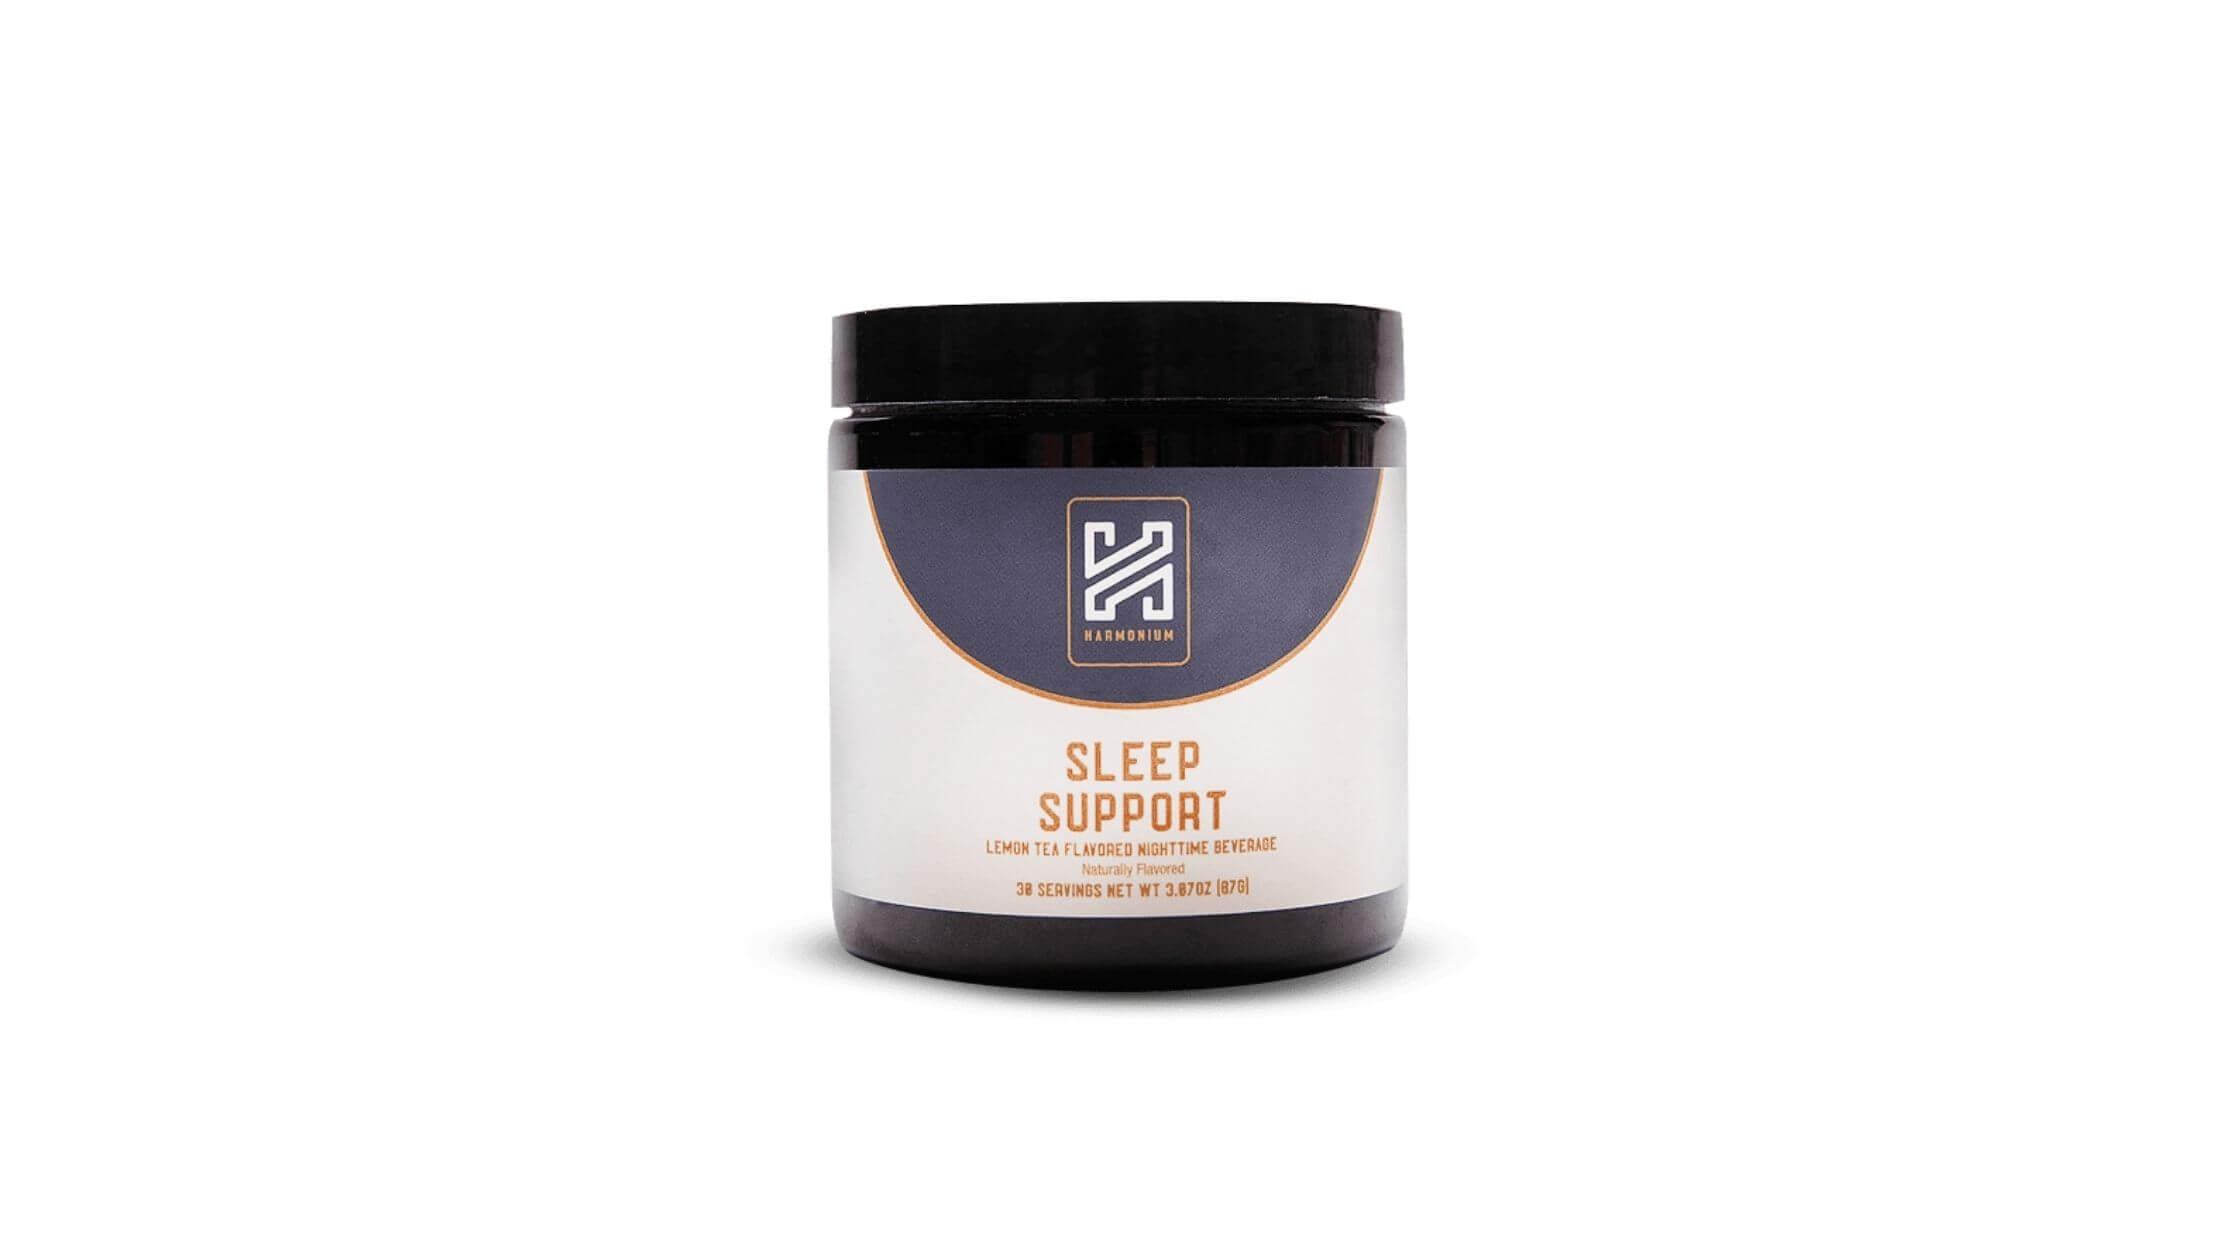 Harmonium Sleep Support Reviews